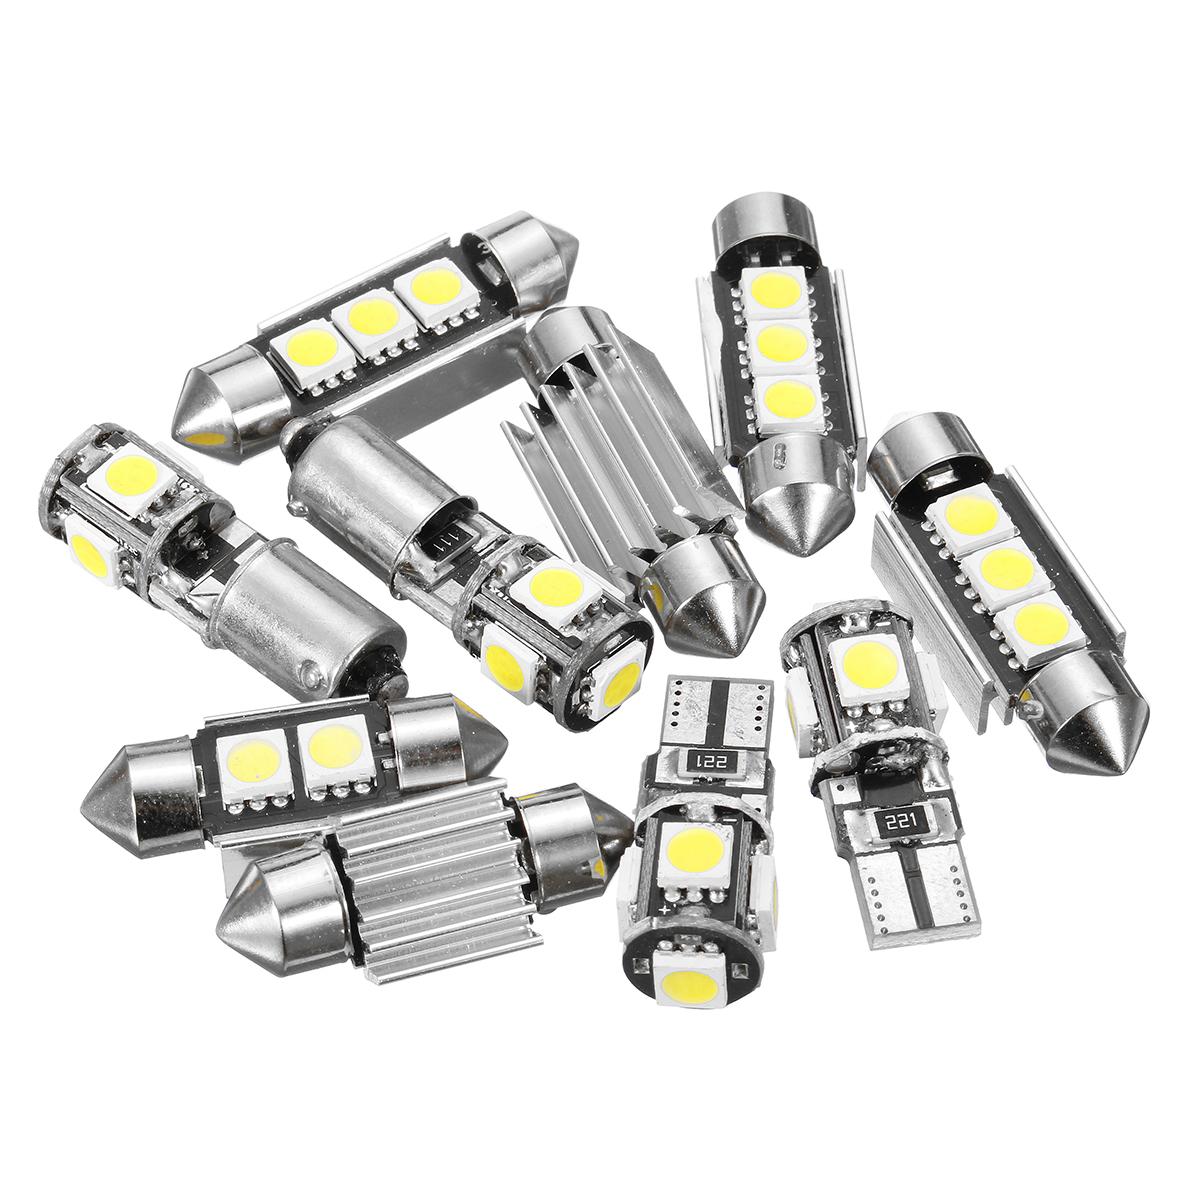 New 12v White Car Interior Led Lamp Replacement Bulb